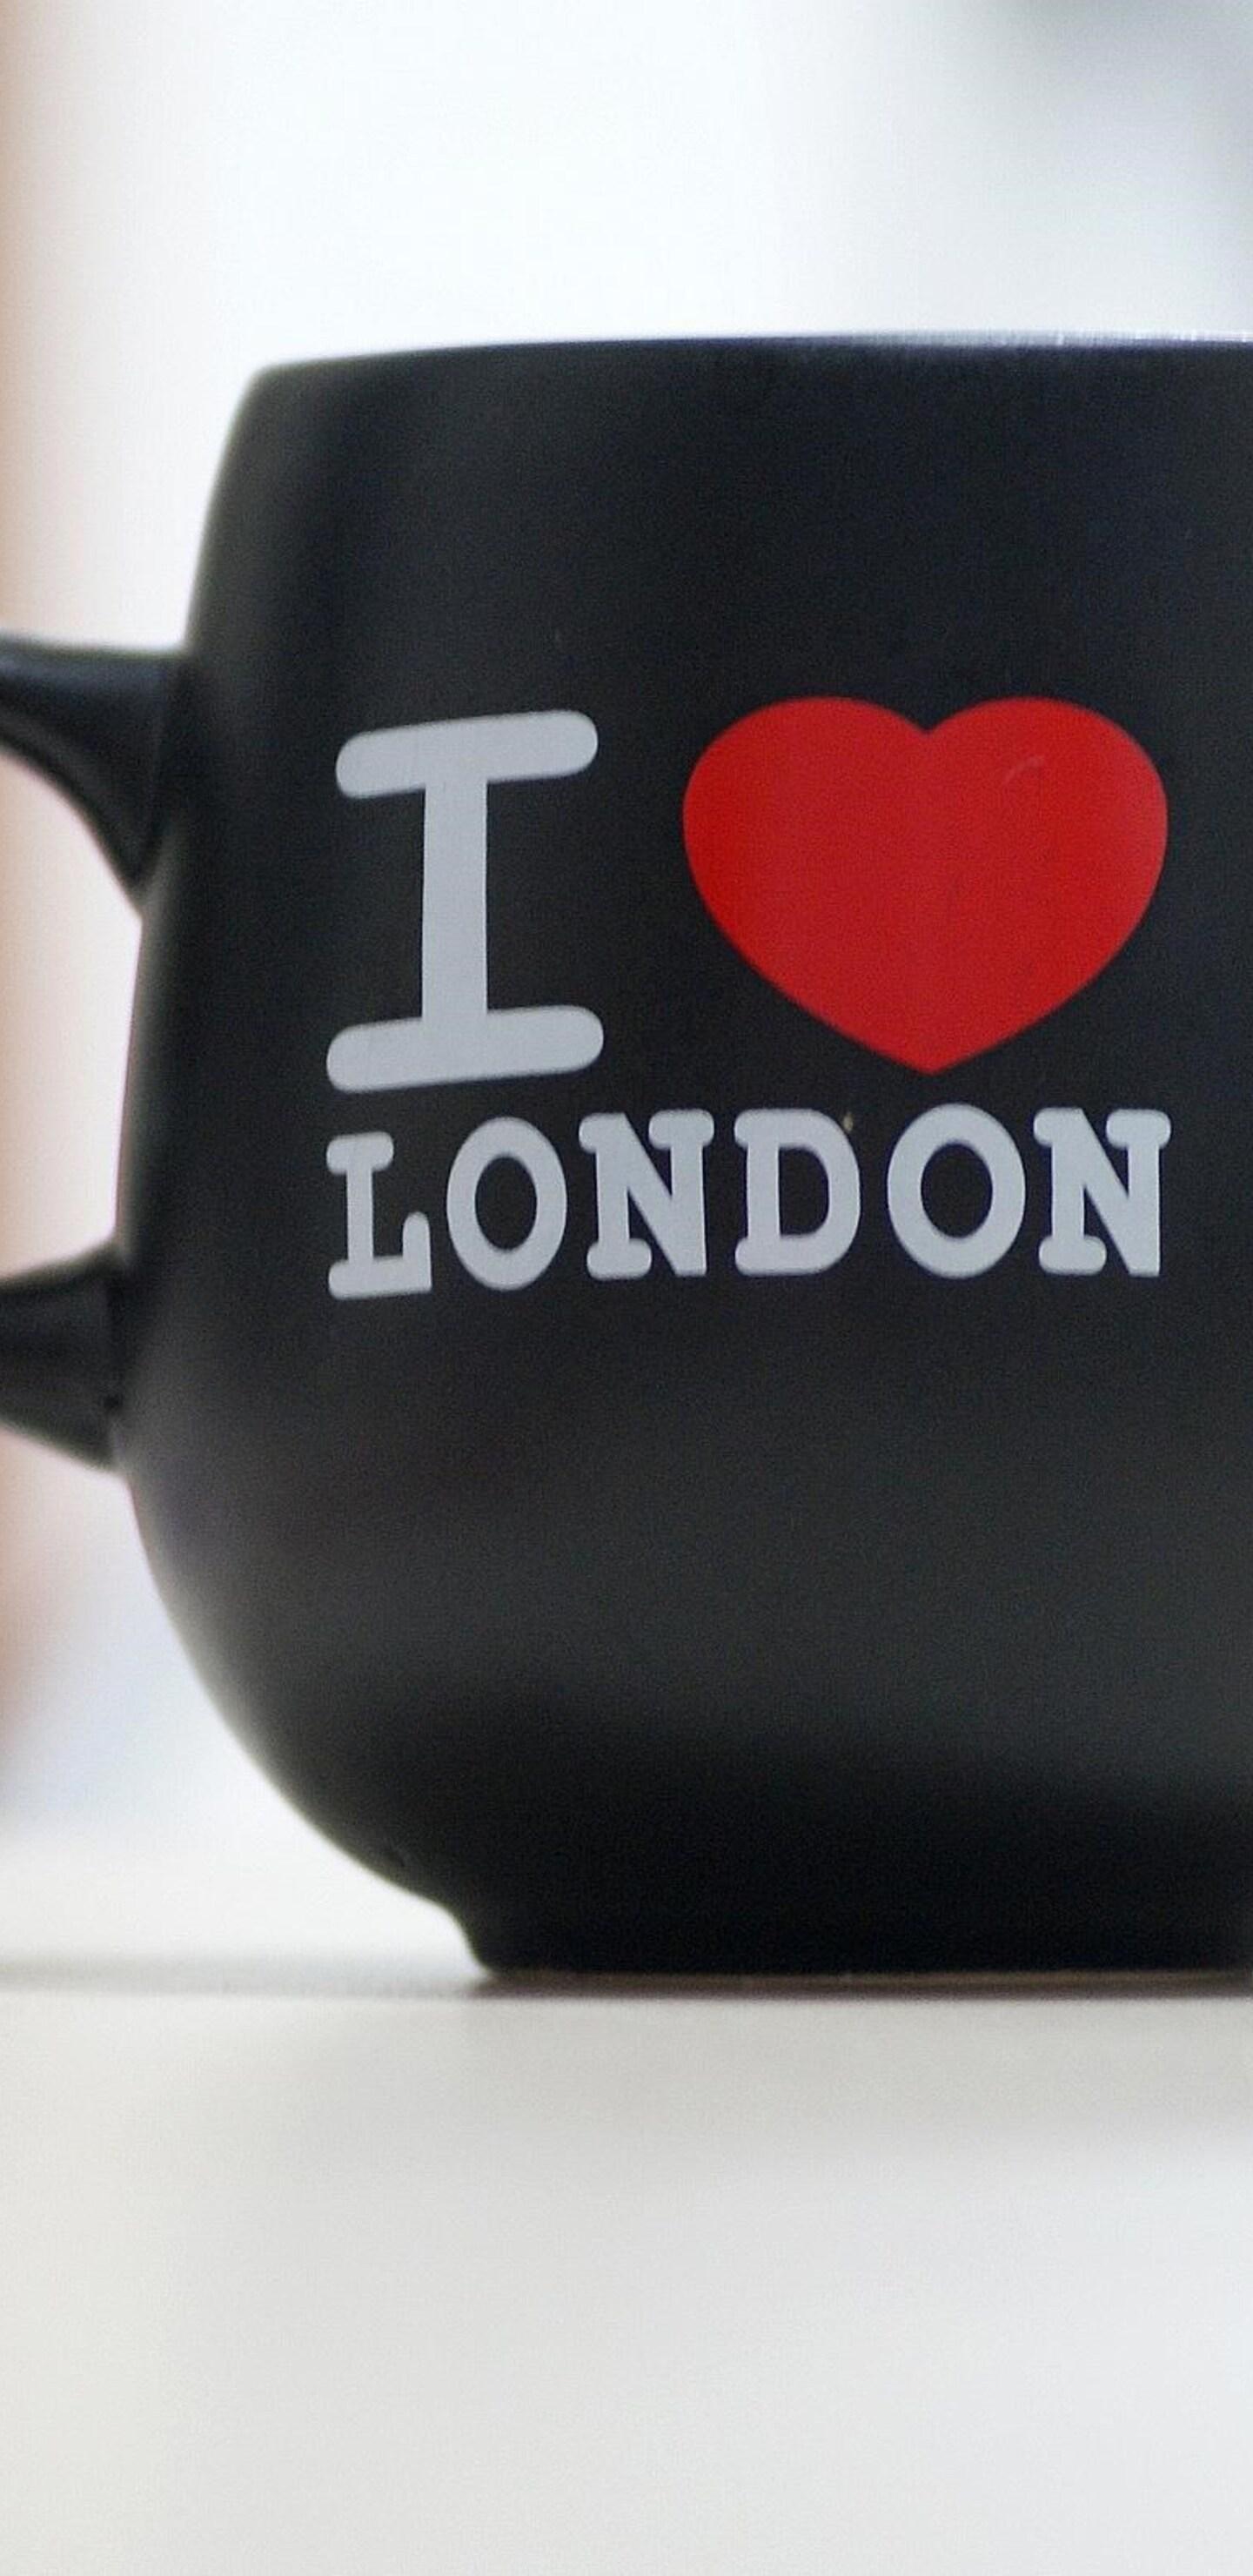 1440x2960 I Love London Samsung Galaxy Note 98 S9s8s8